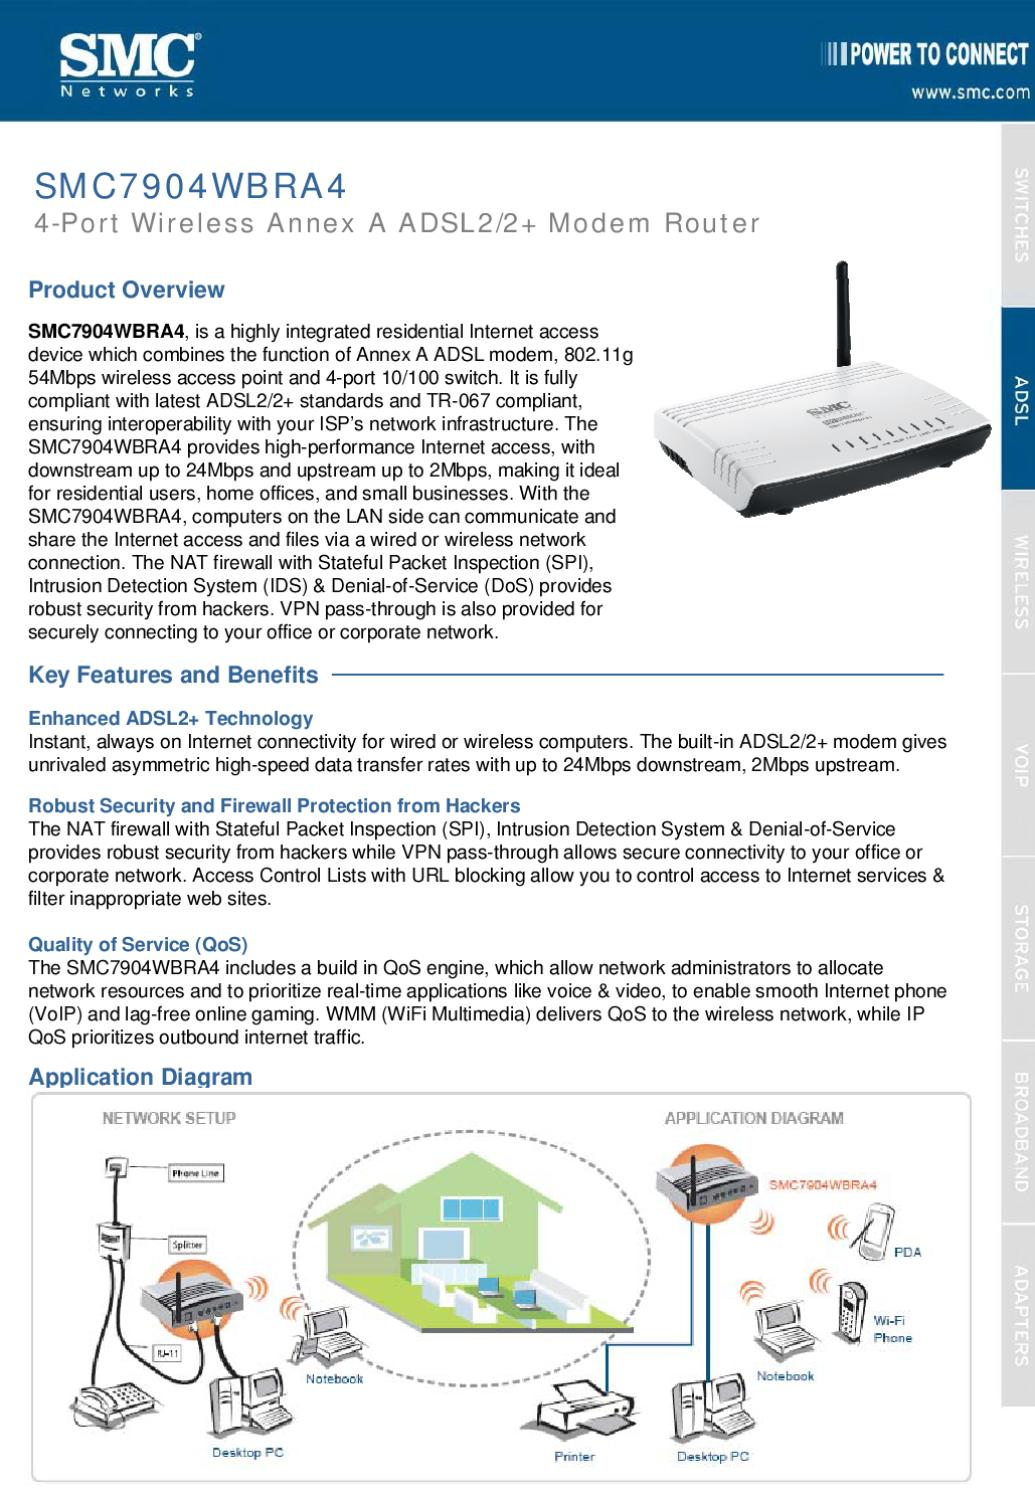 router wireless g com modem wireless smc 7904wbra4 manual router wireless g com modem wireless smc 7904wbra4 manual sonigate by sonigate issuu